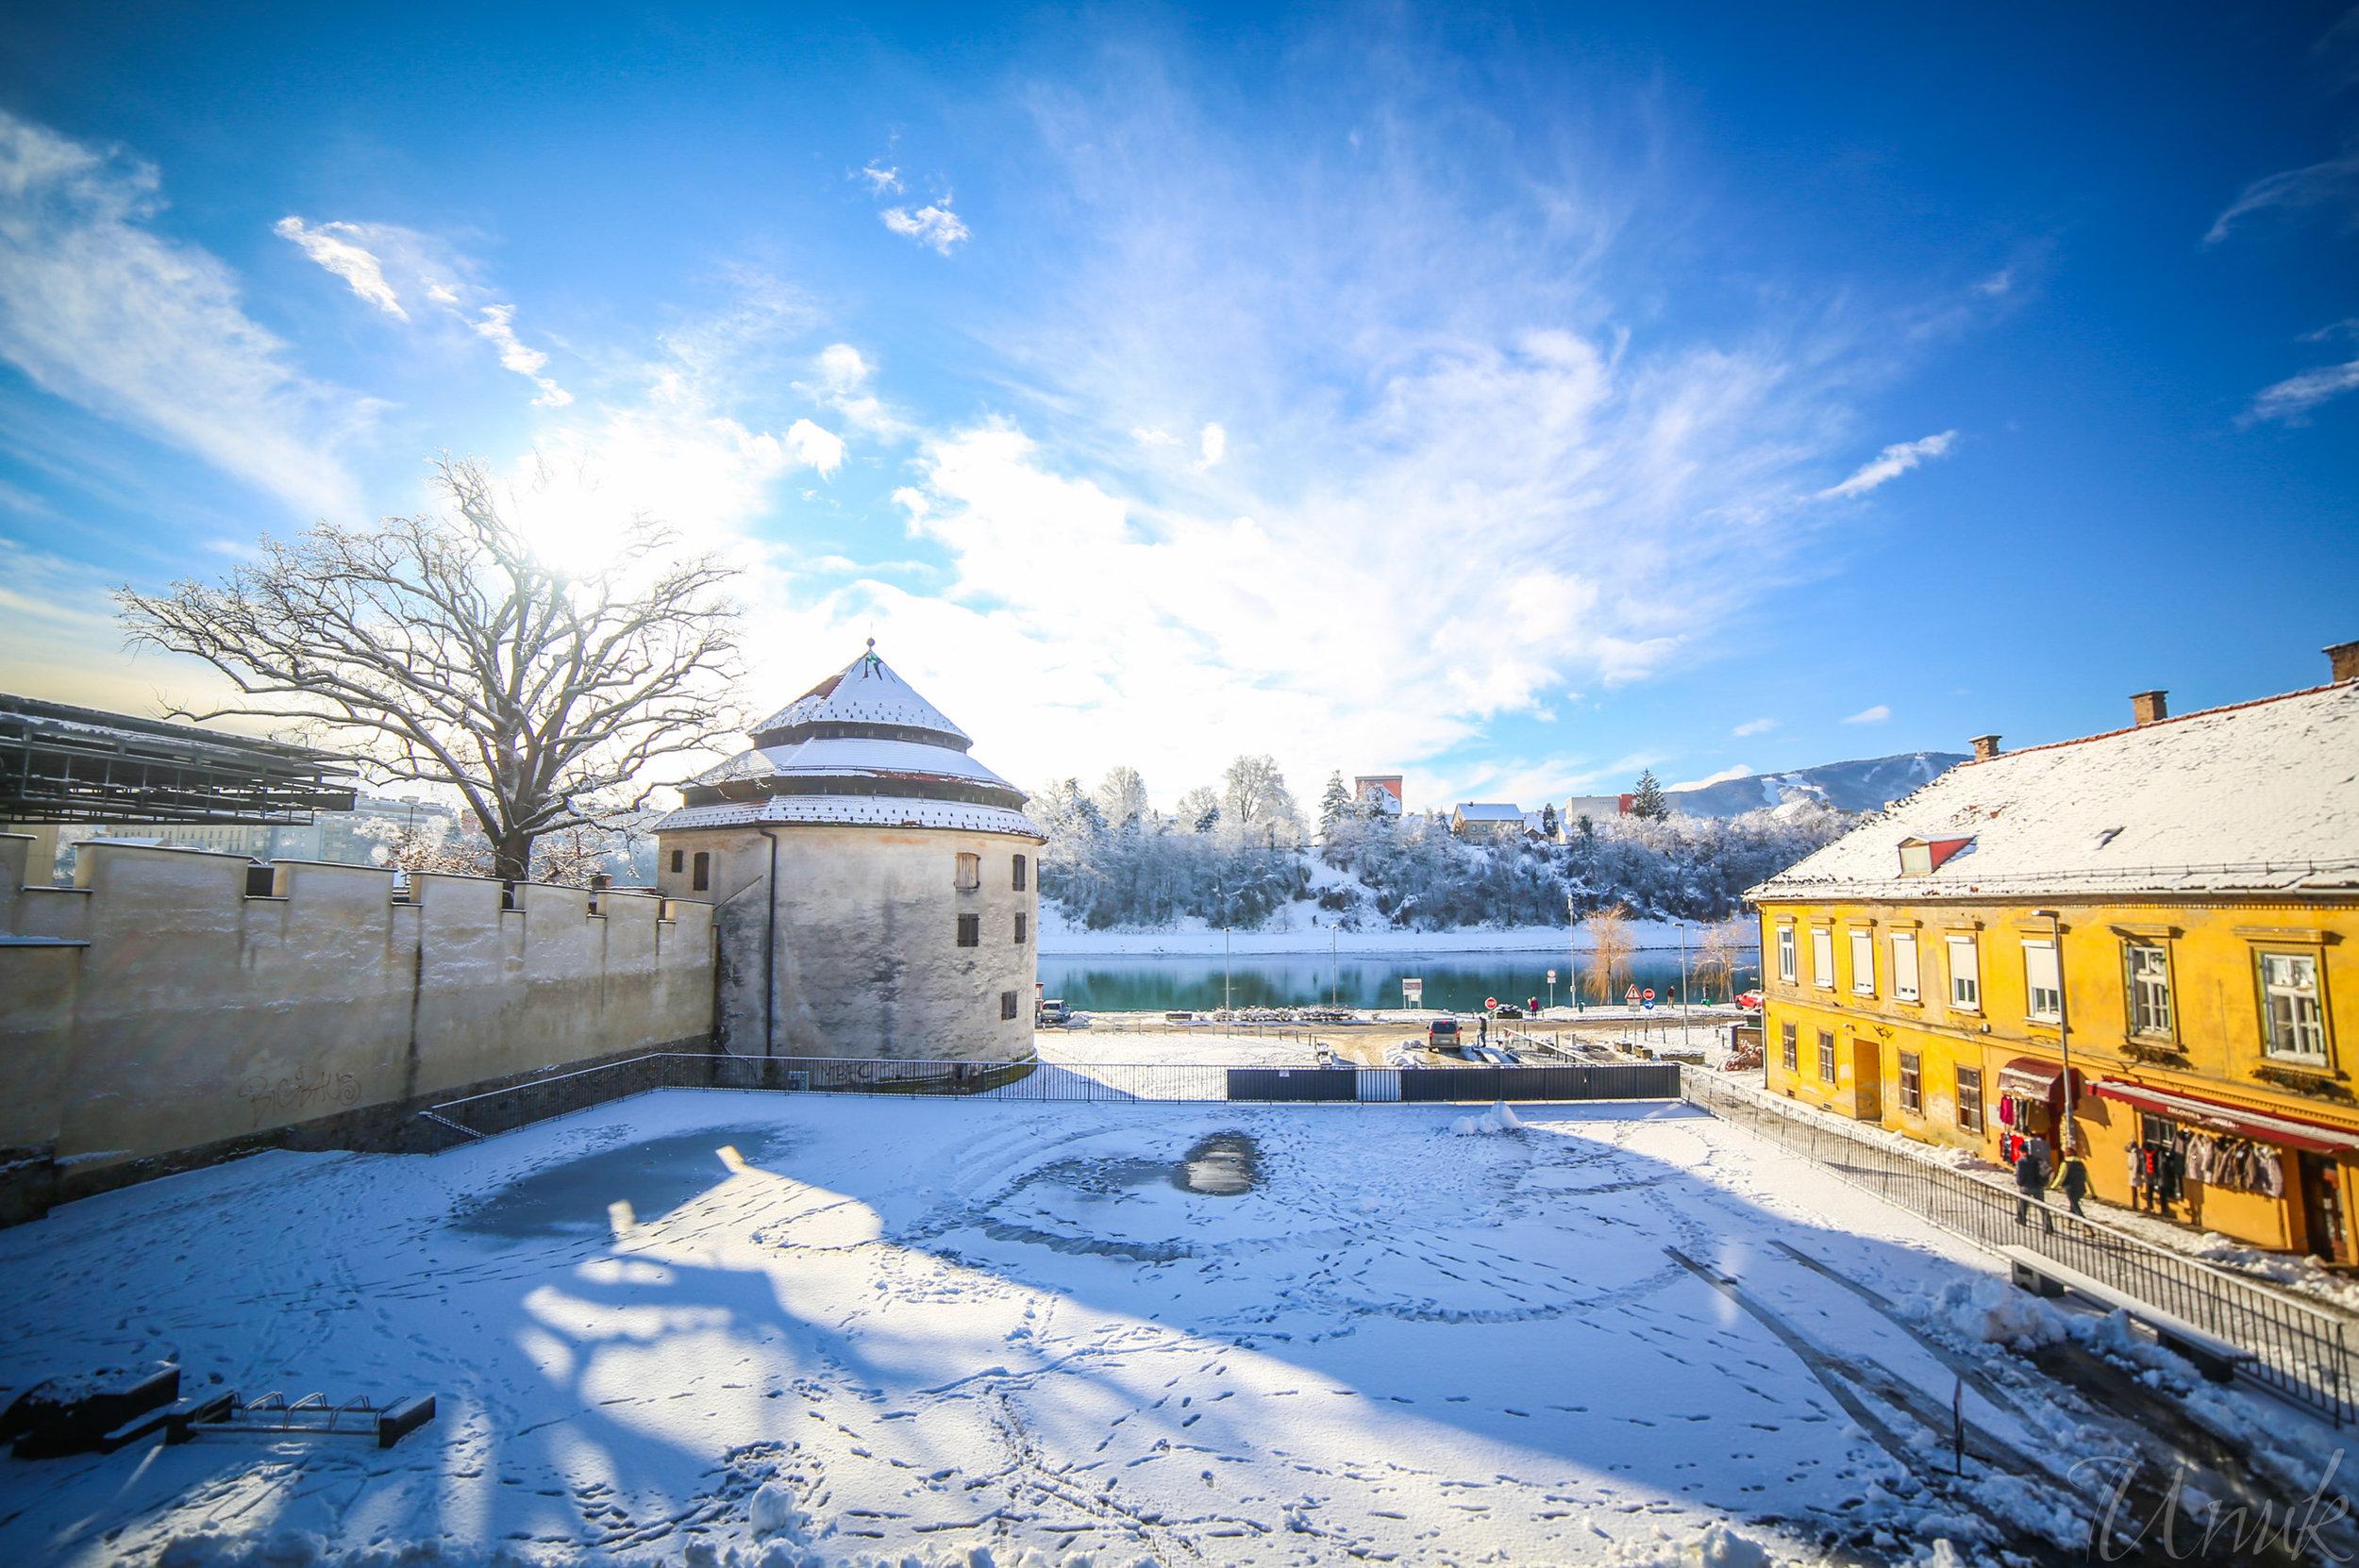 Foto: Igor Unuk - Old Walls in Winter